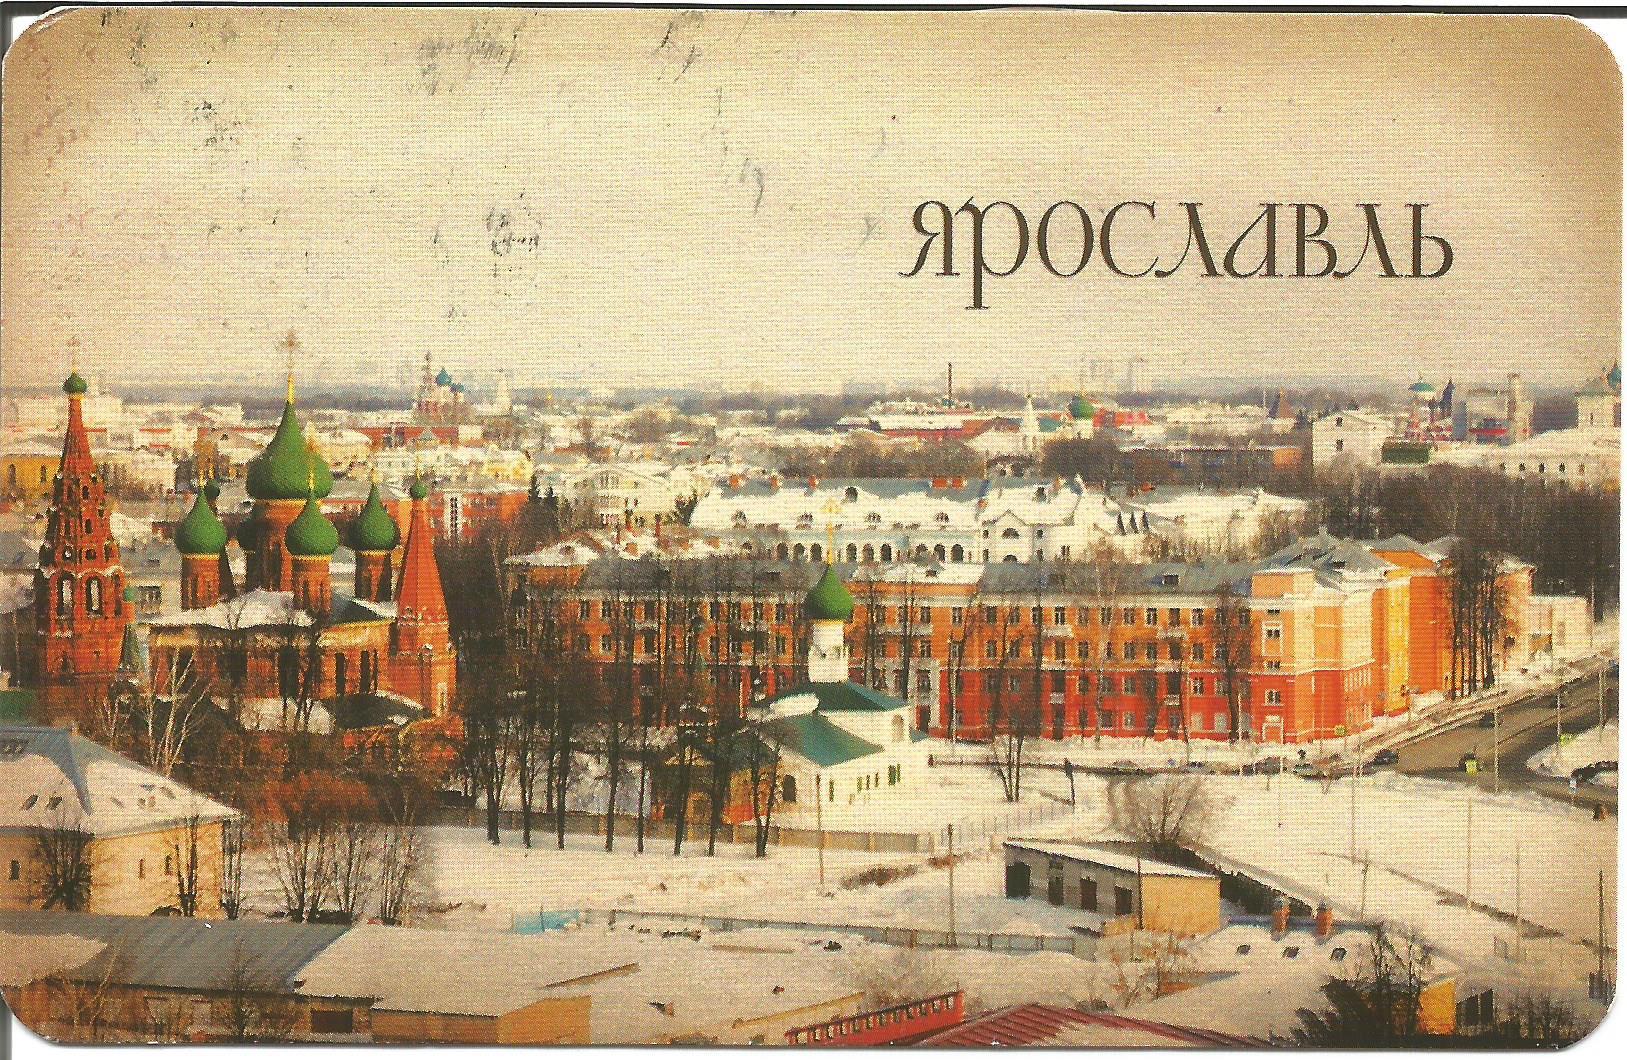 pohled-rusko-jaroslav-1